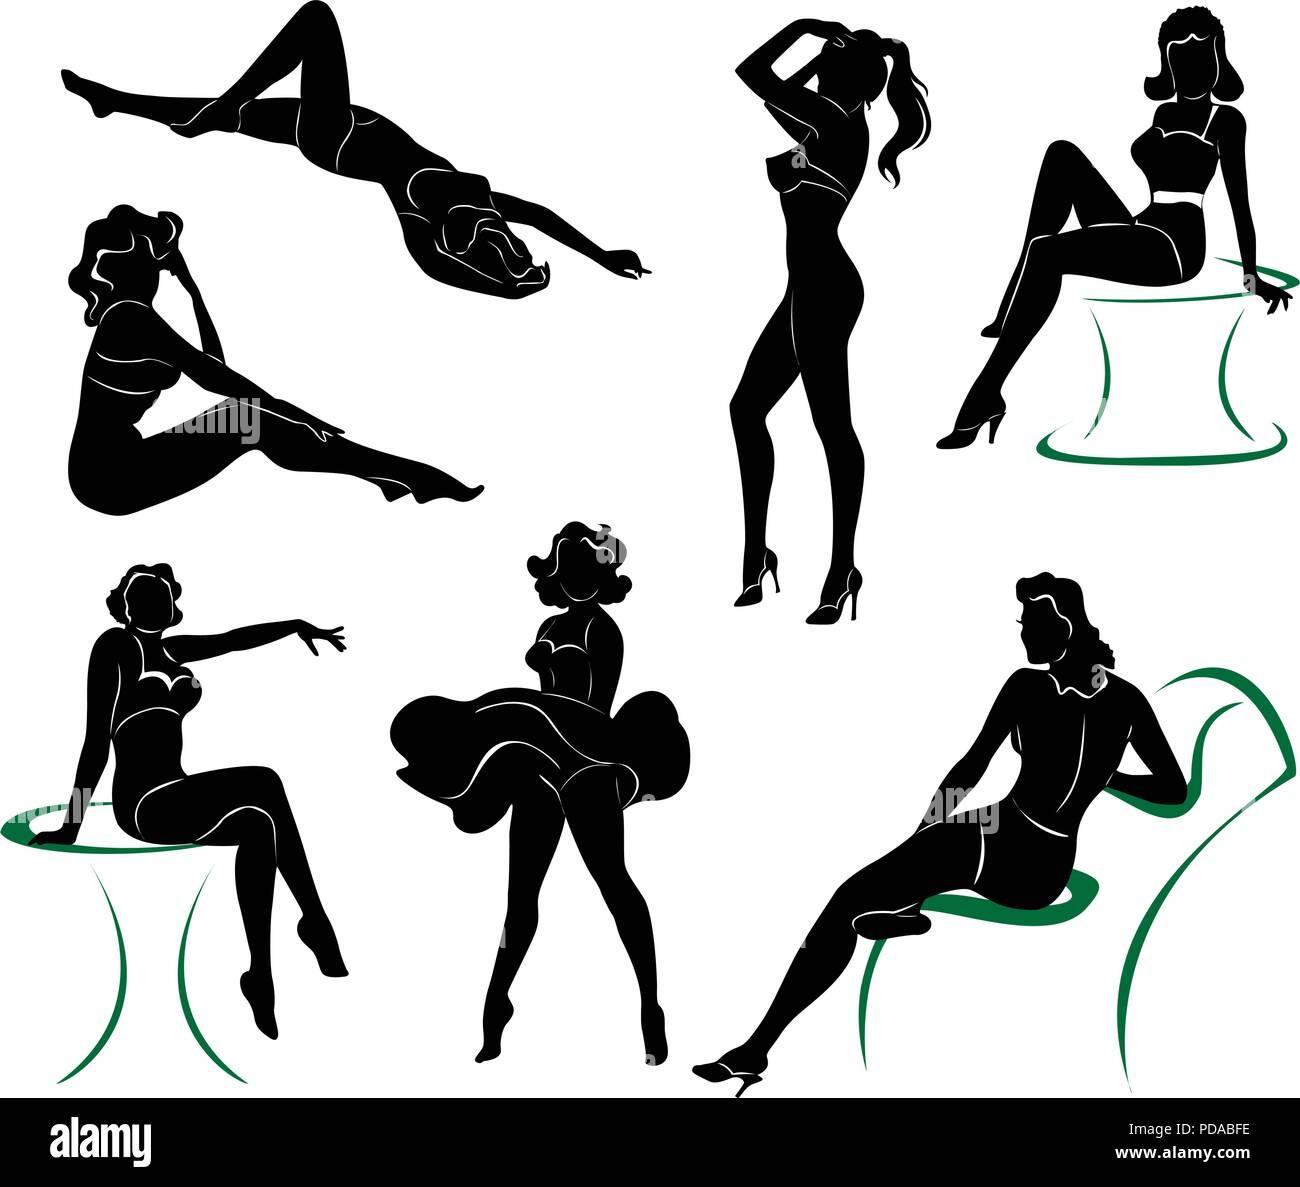 vector silhouette of pin up girls stock vector art illustration